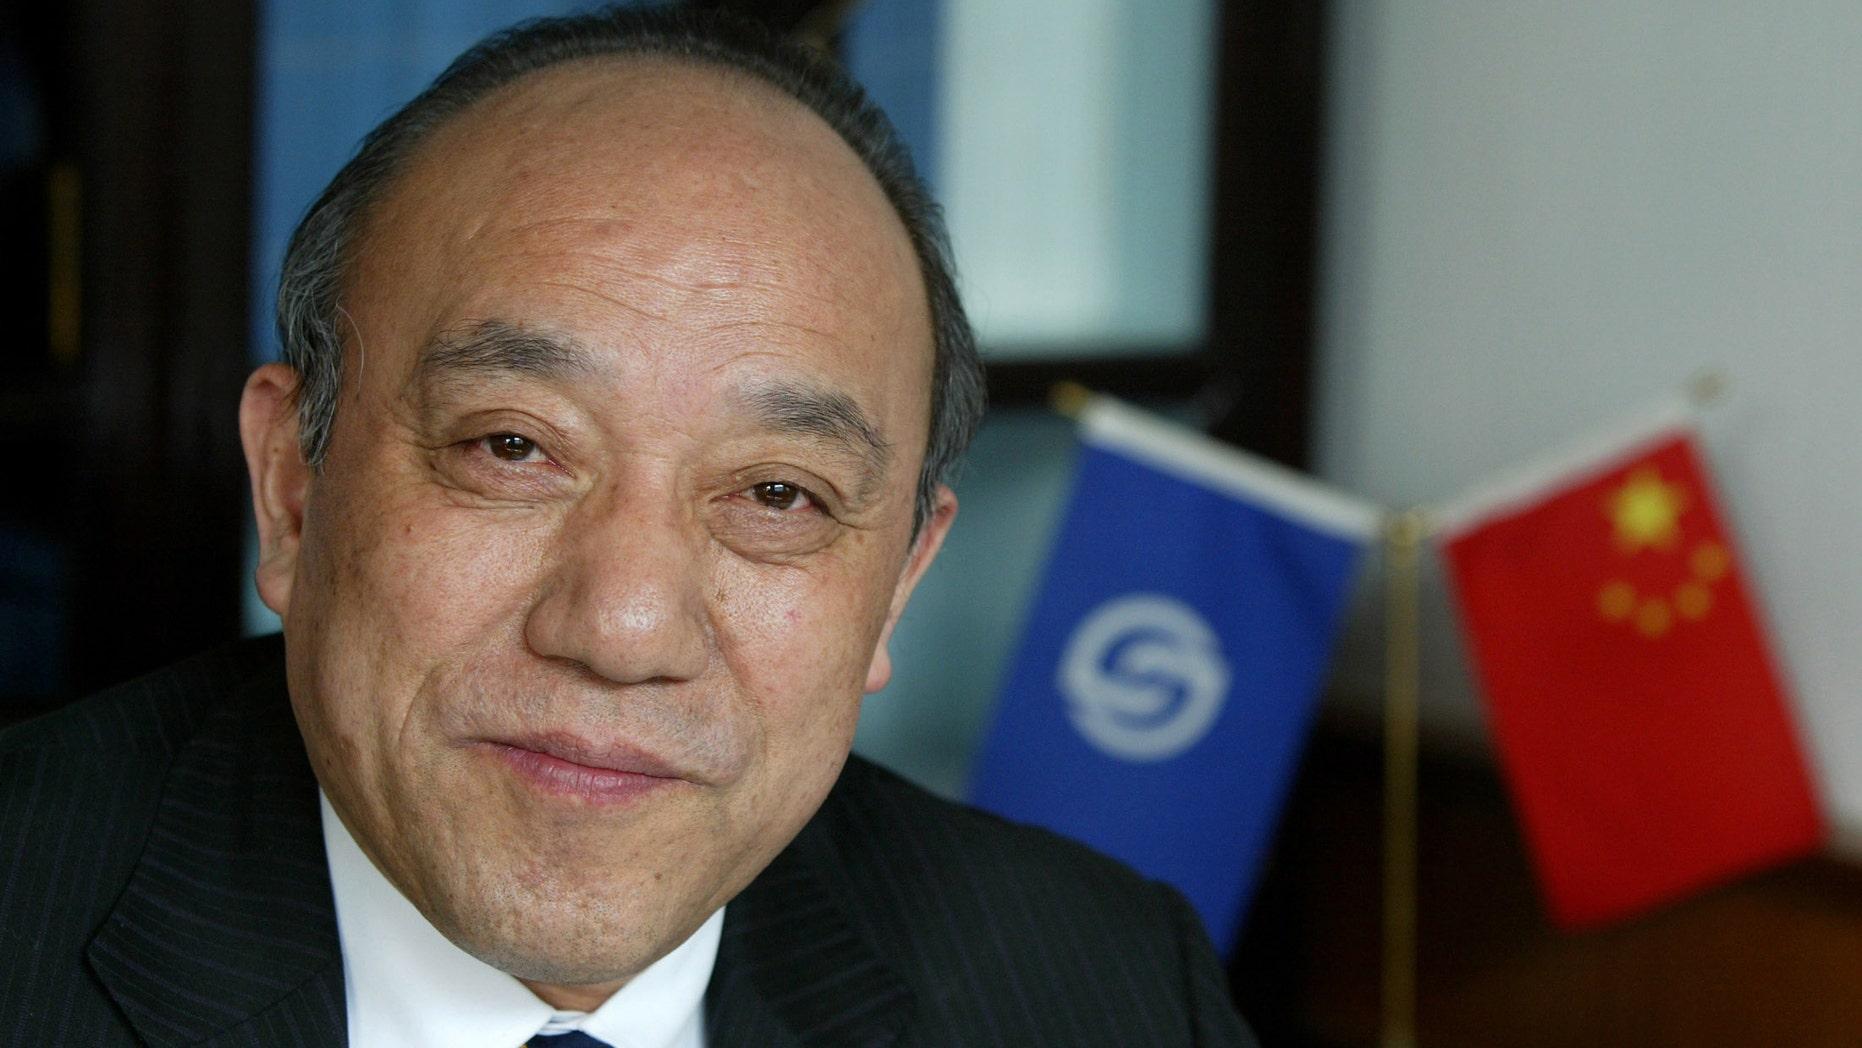 Feb. 21, 2004: Lu Guanqiu, board chairman of Wanxiang Group, sits in his office at the company's headquarters in Xiaoshan, China.